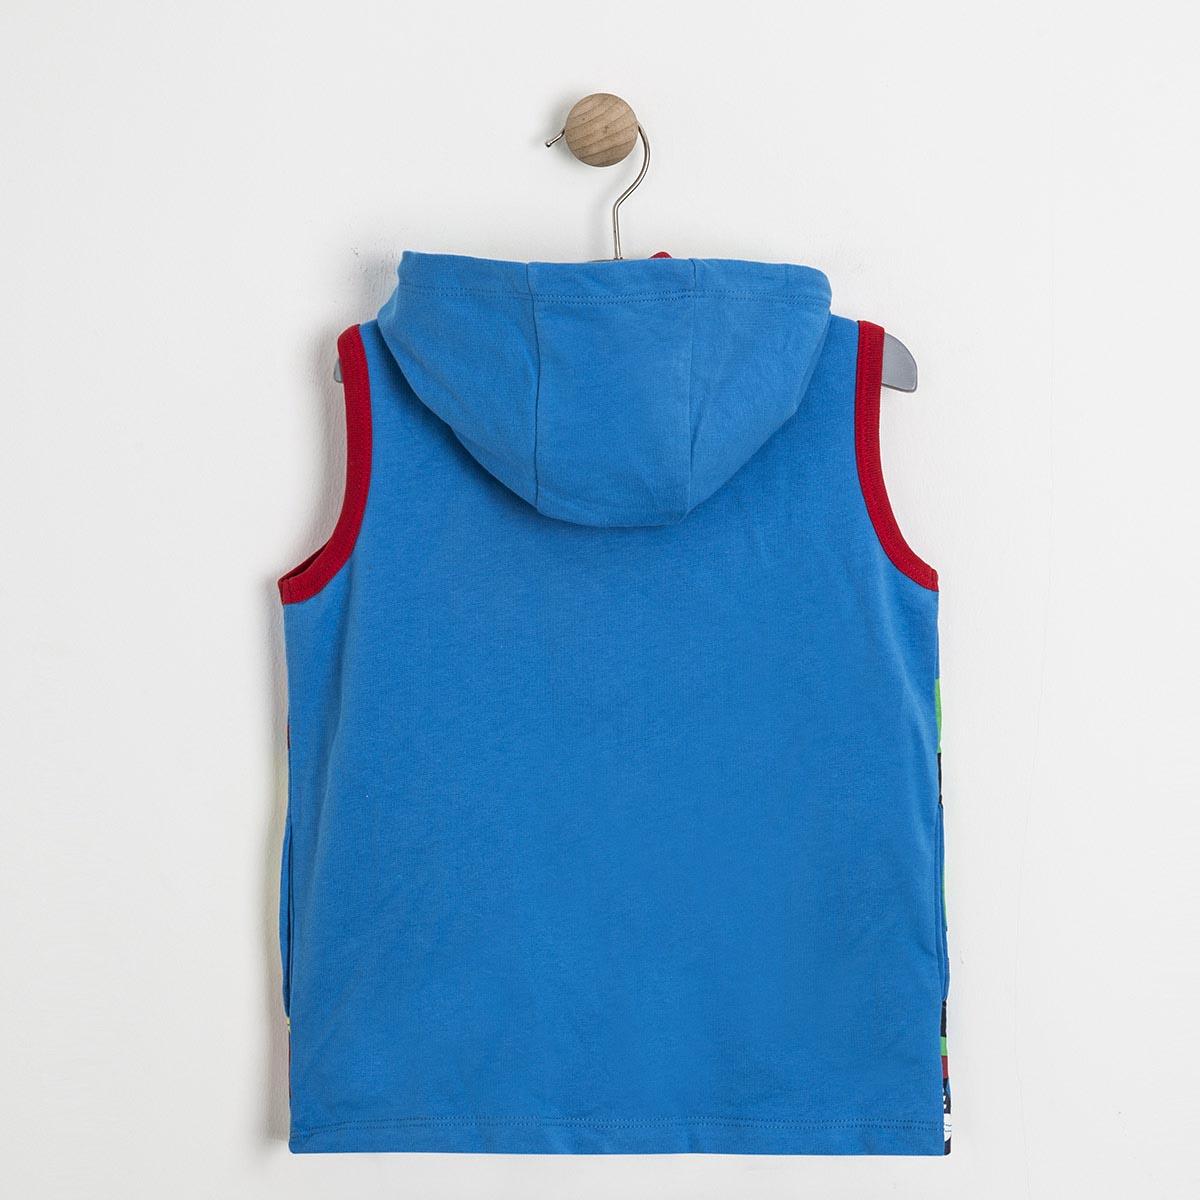 Erkek Çocuk Yelek Mavi (1-7 yaş)